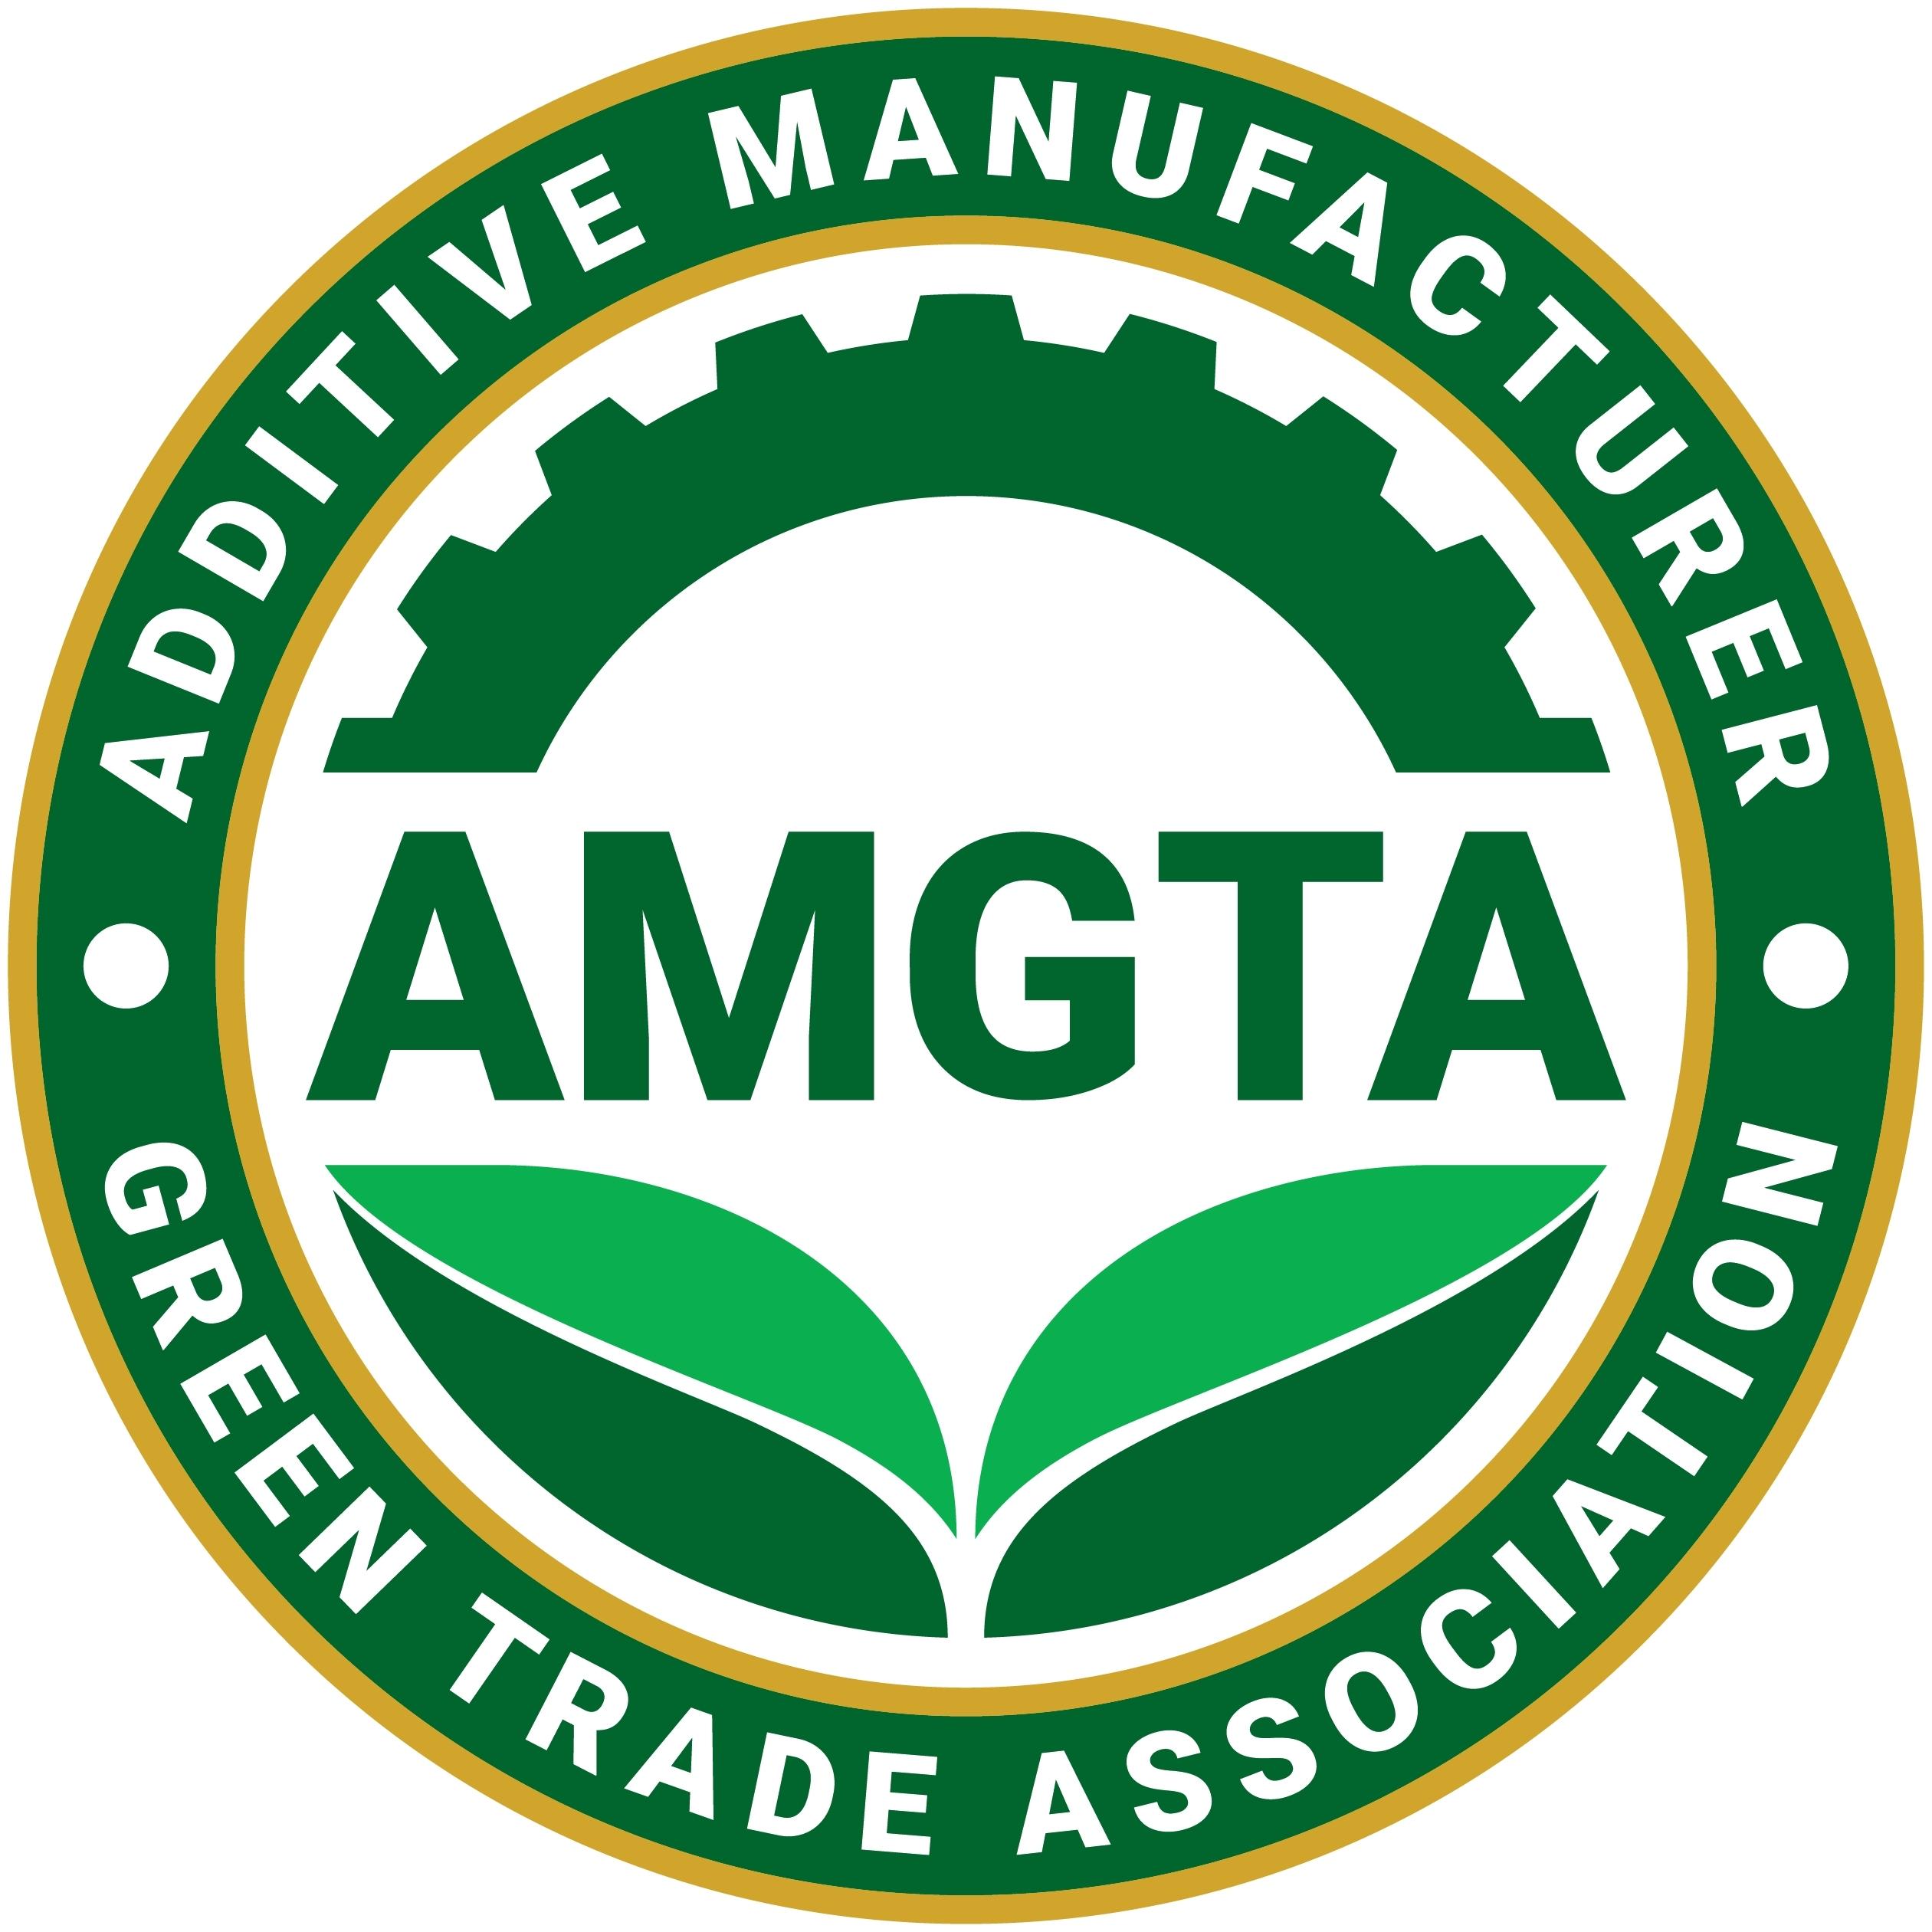 GEアディティブ、SLMソルーションズなどがアディティブ・マニュファクチャラー・グリーン・トレード・アソシエーションに加盟